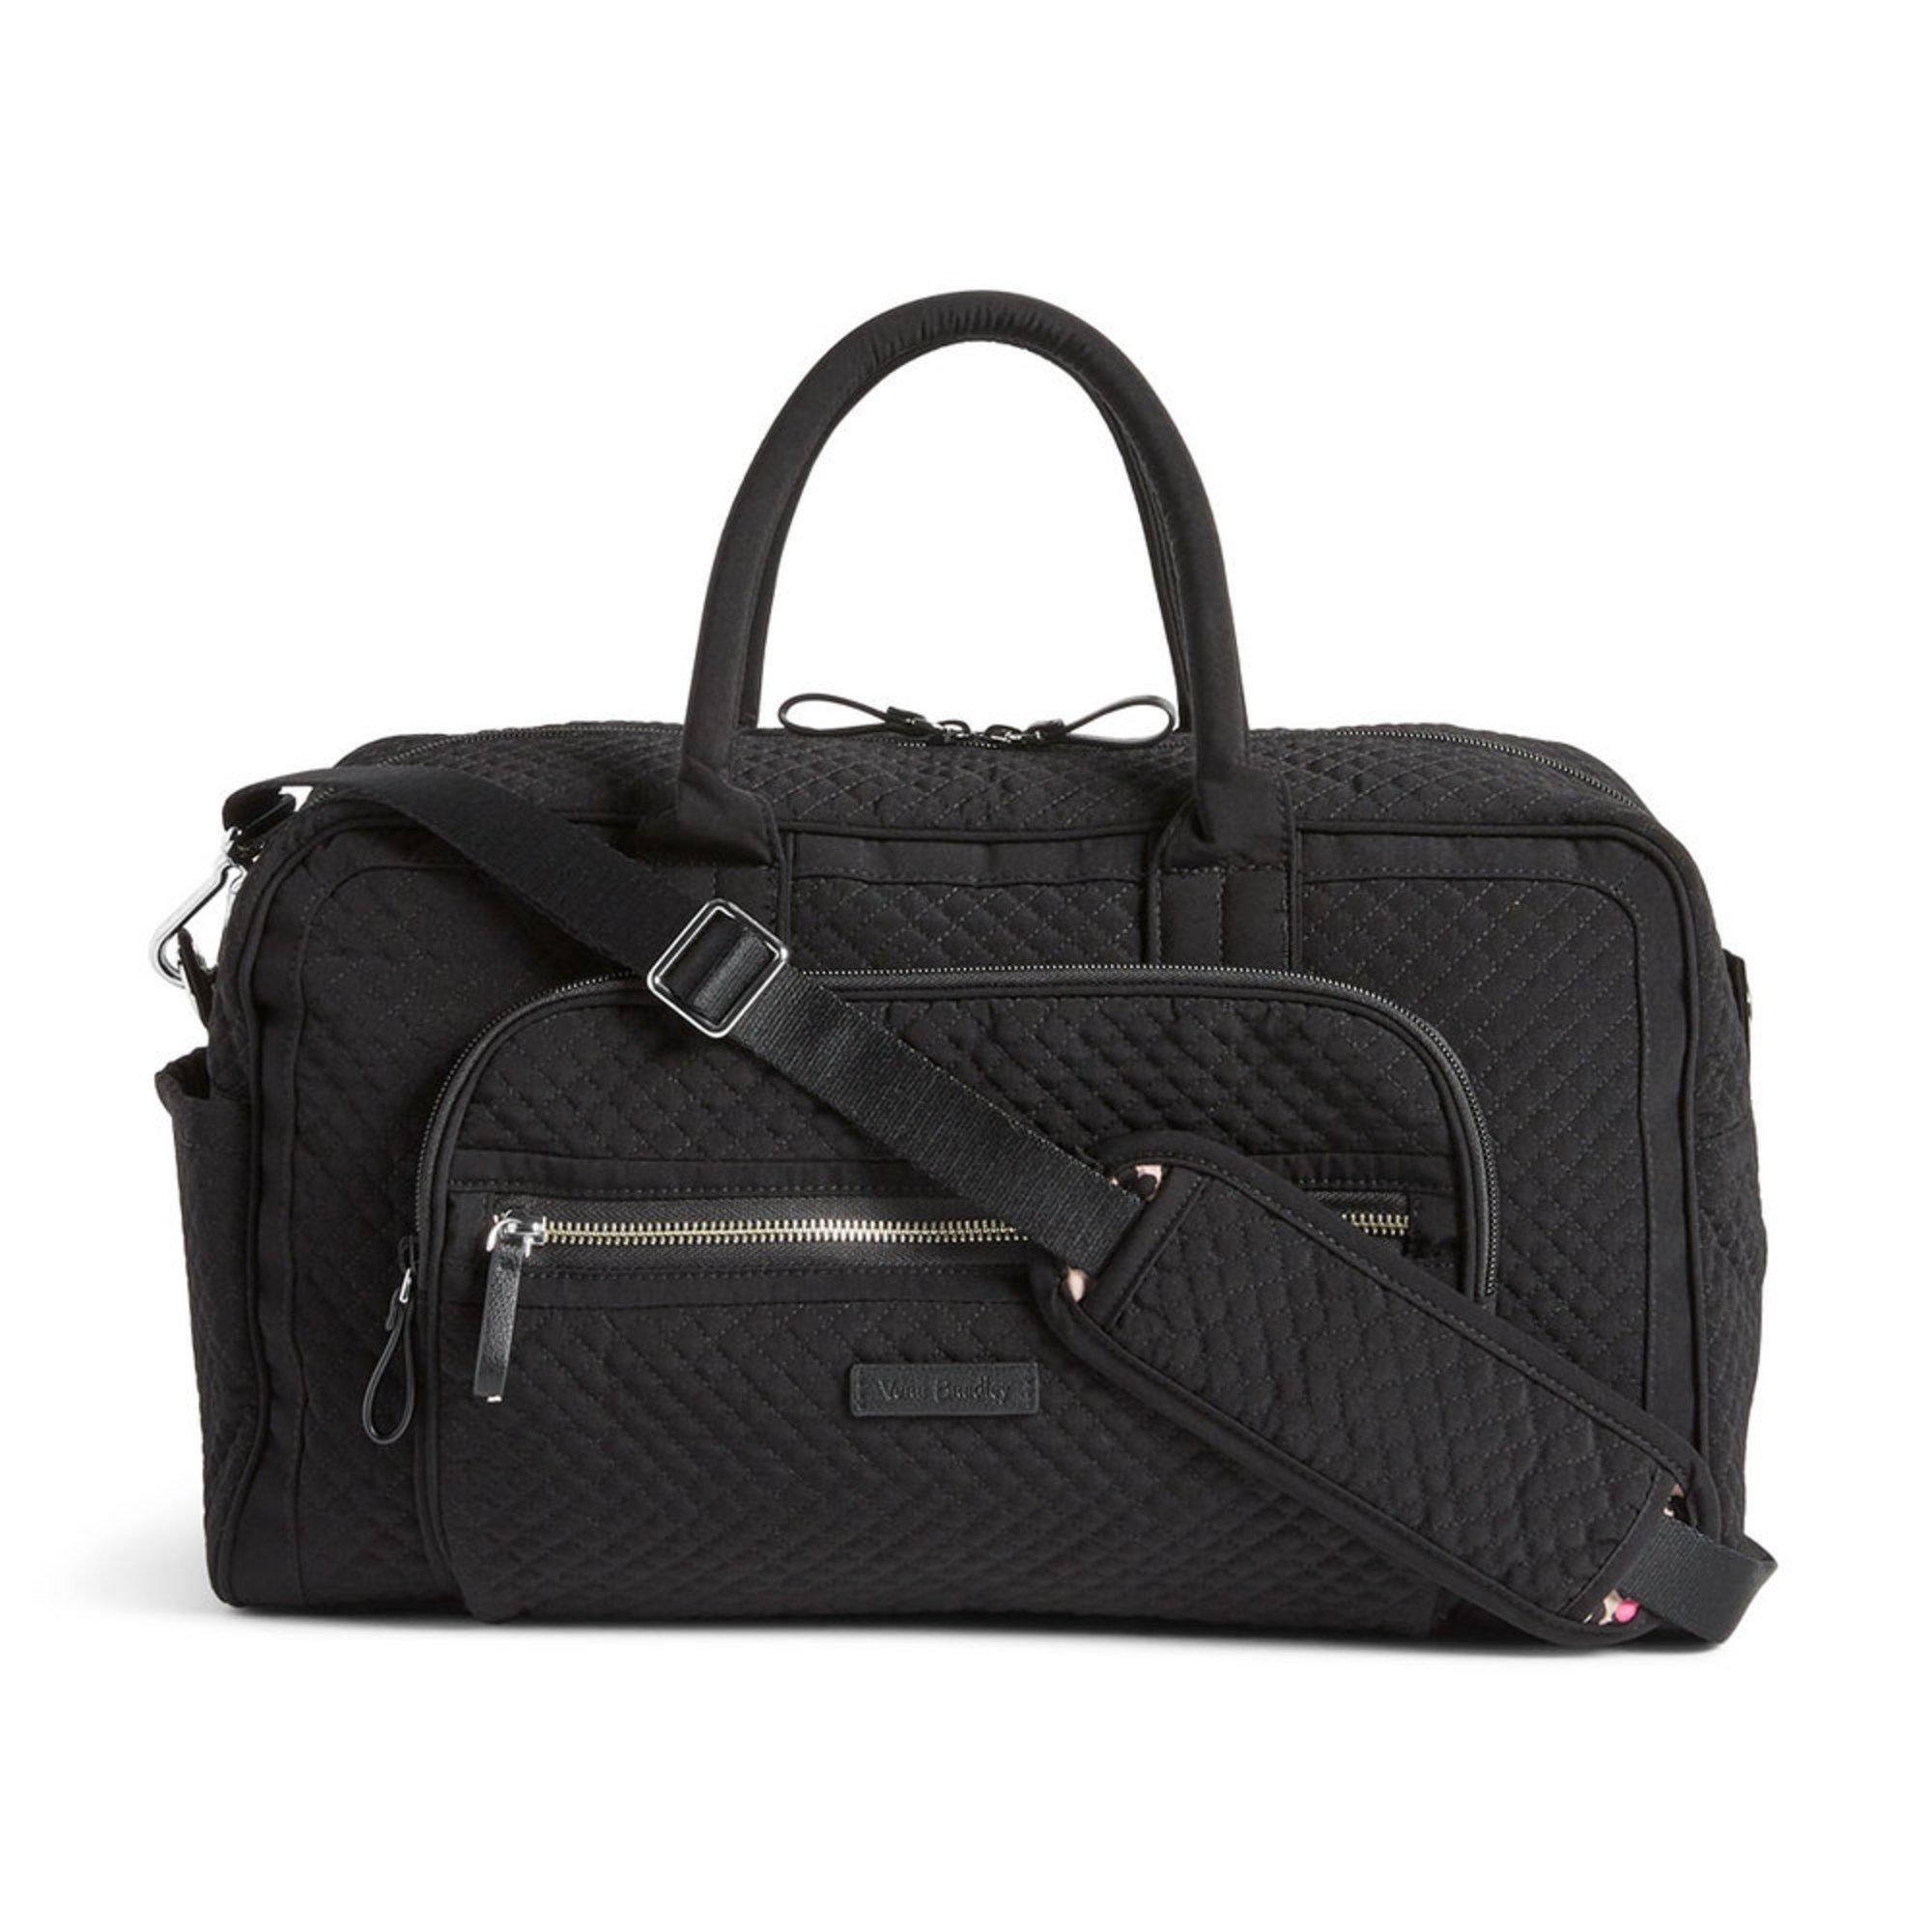 Vera Bradley Compact Weekender Travel Bag Iconic Black  389e233e29c67